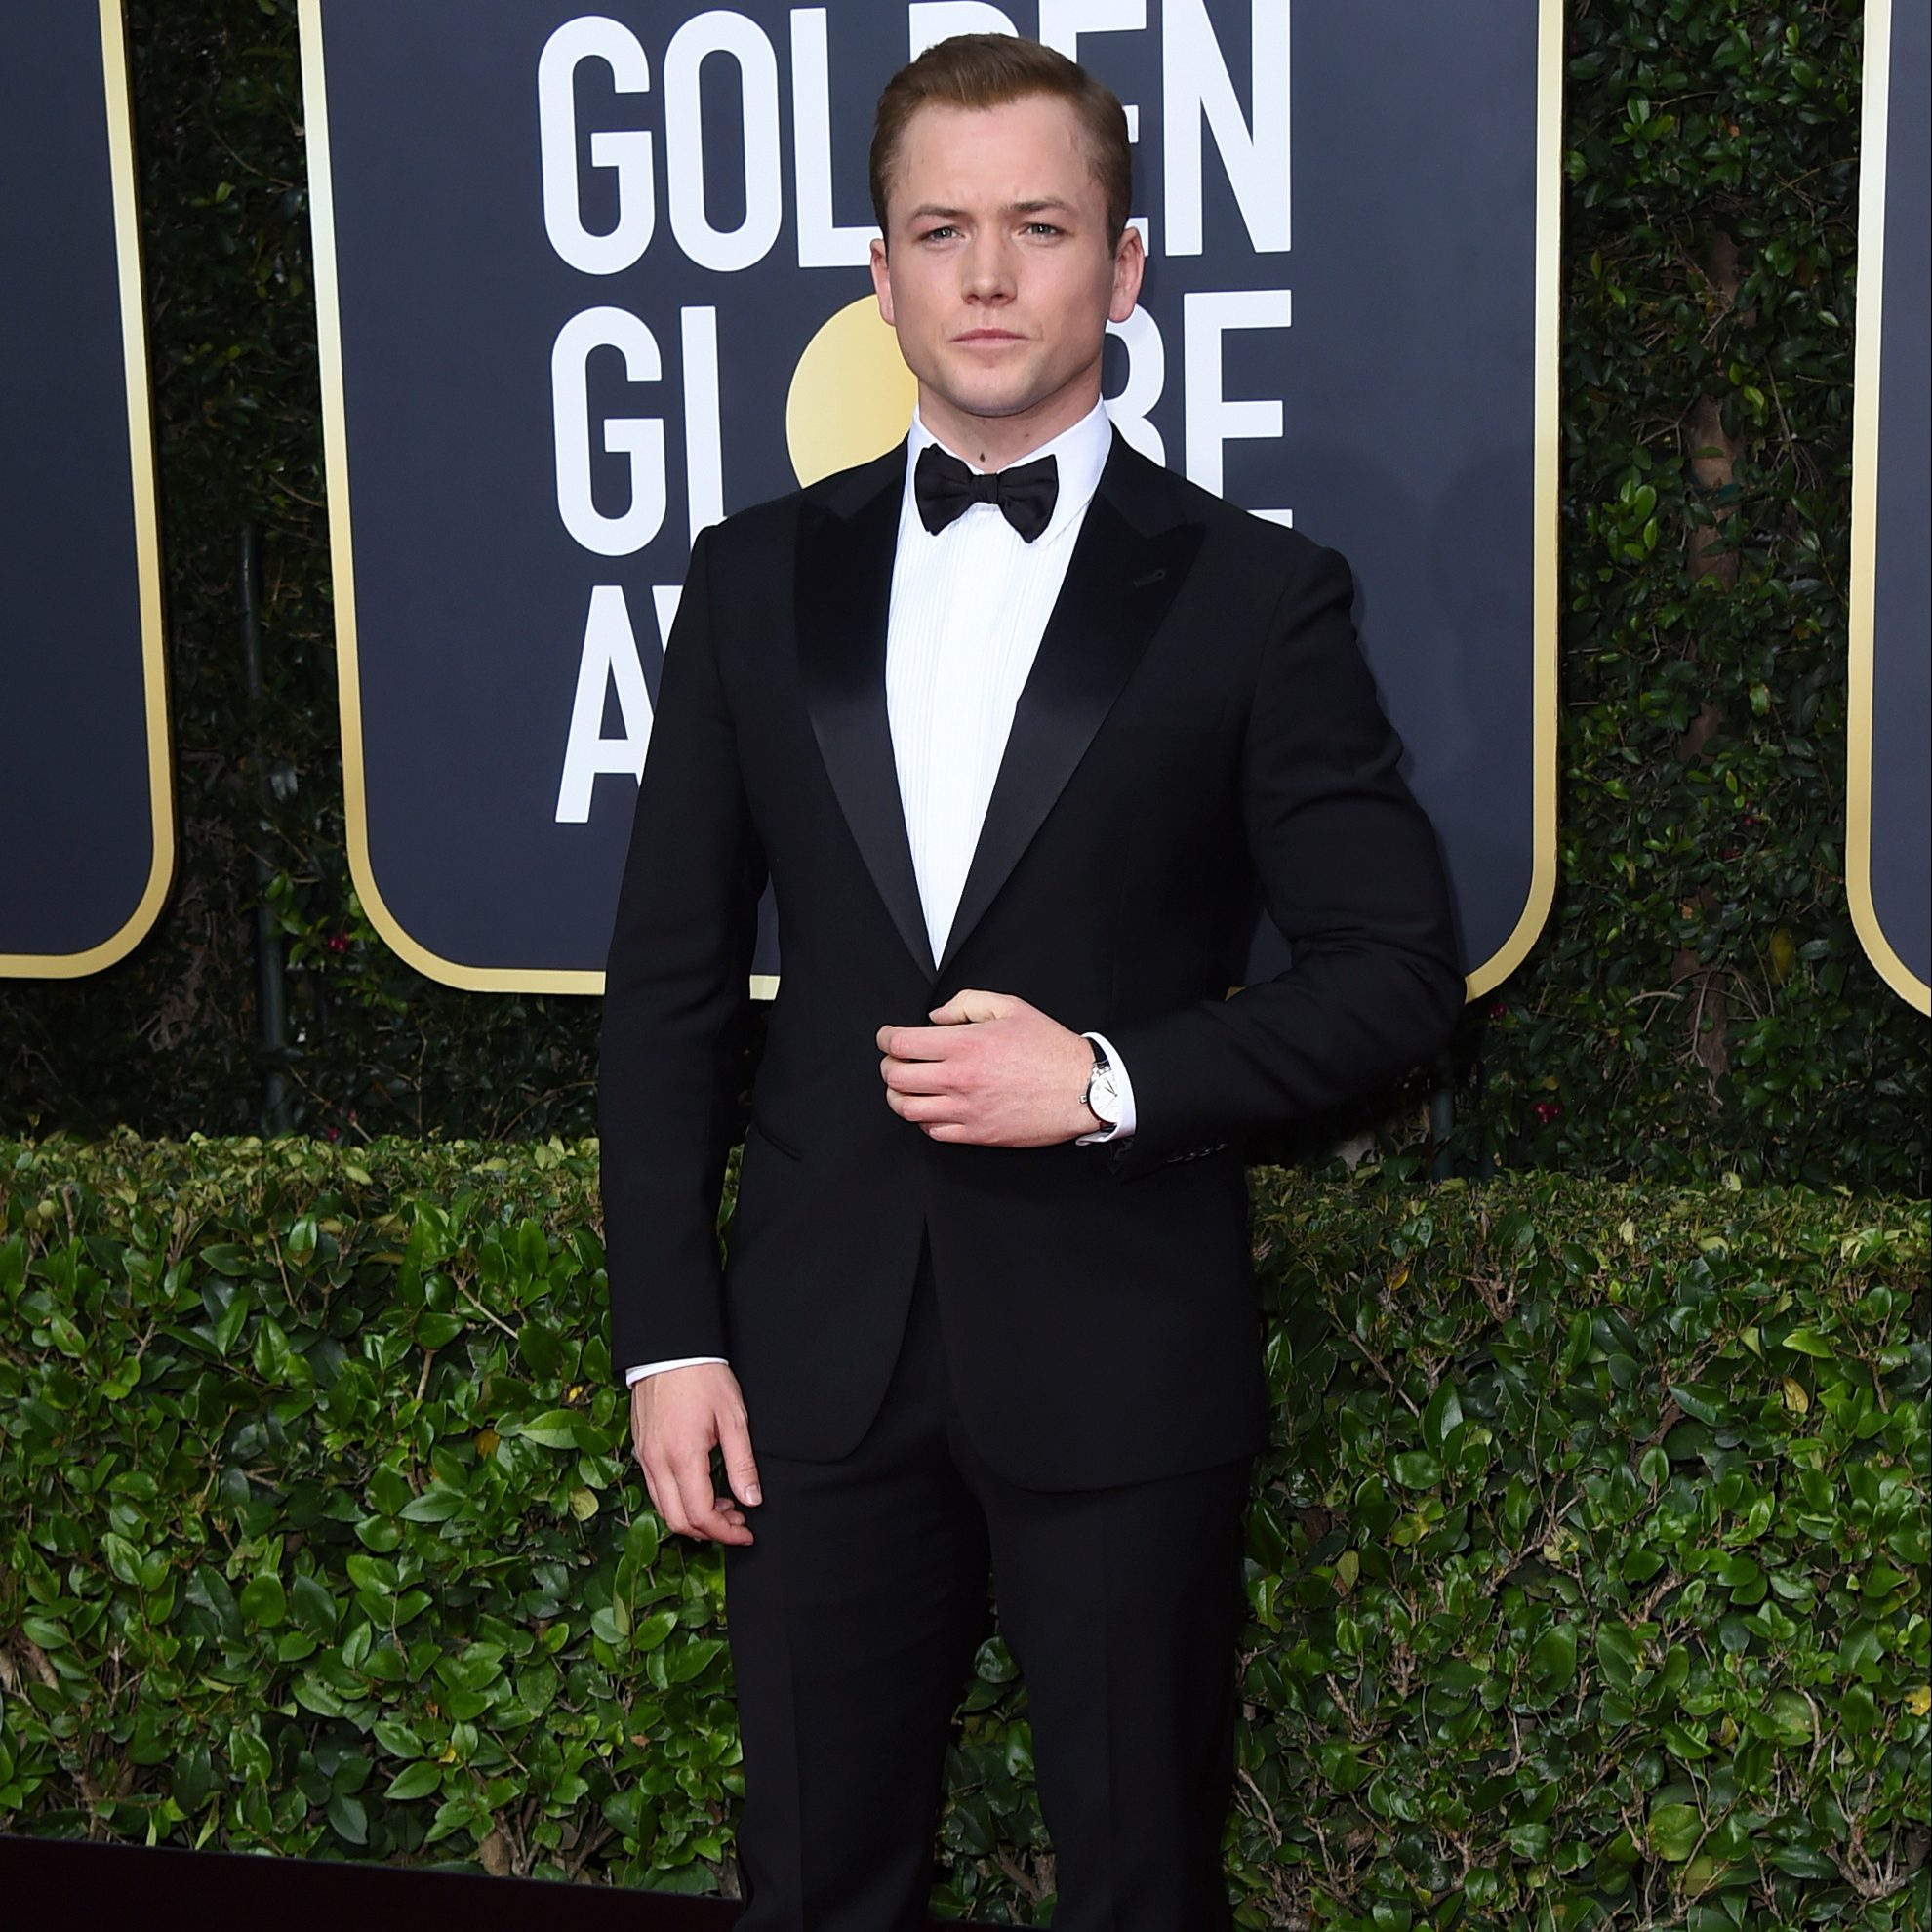 77th Annual Golden Globe Awards Arrivals 64464jpg dc45fjpg JS551901758 e1579090407898 20 Actors Who Would Kill It As The Next James Bond